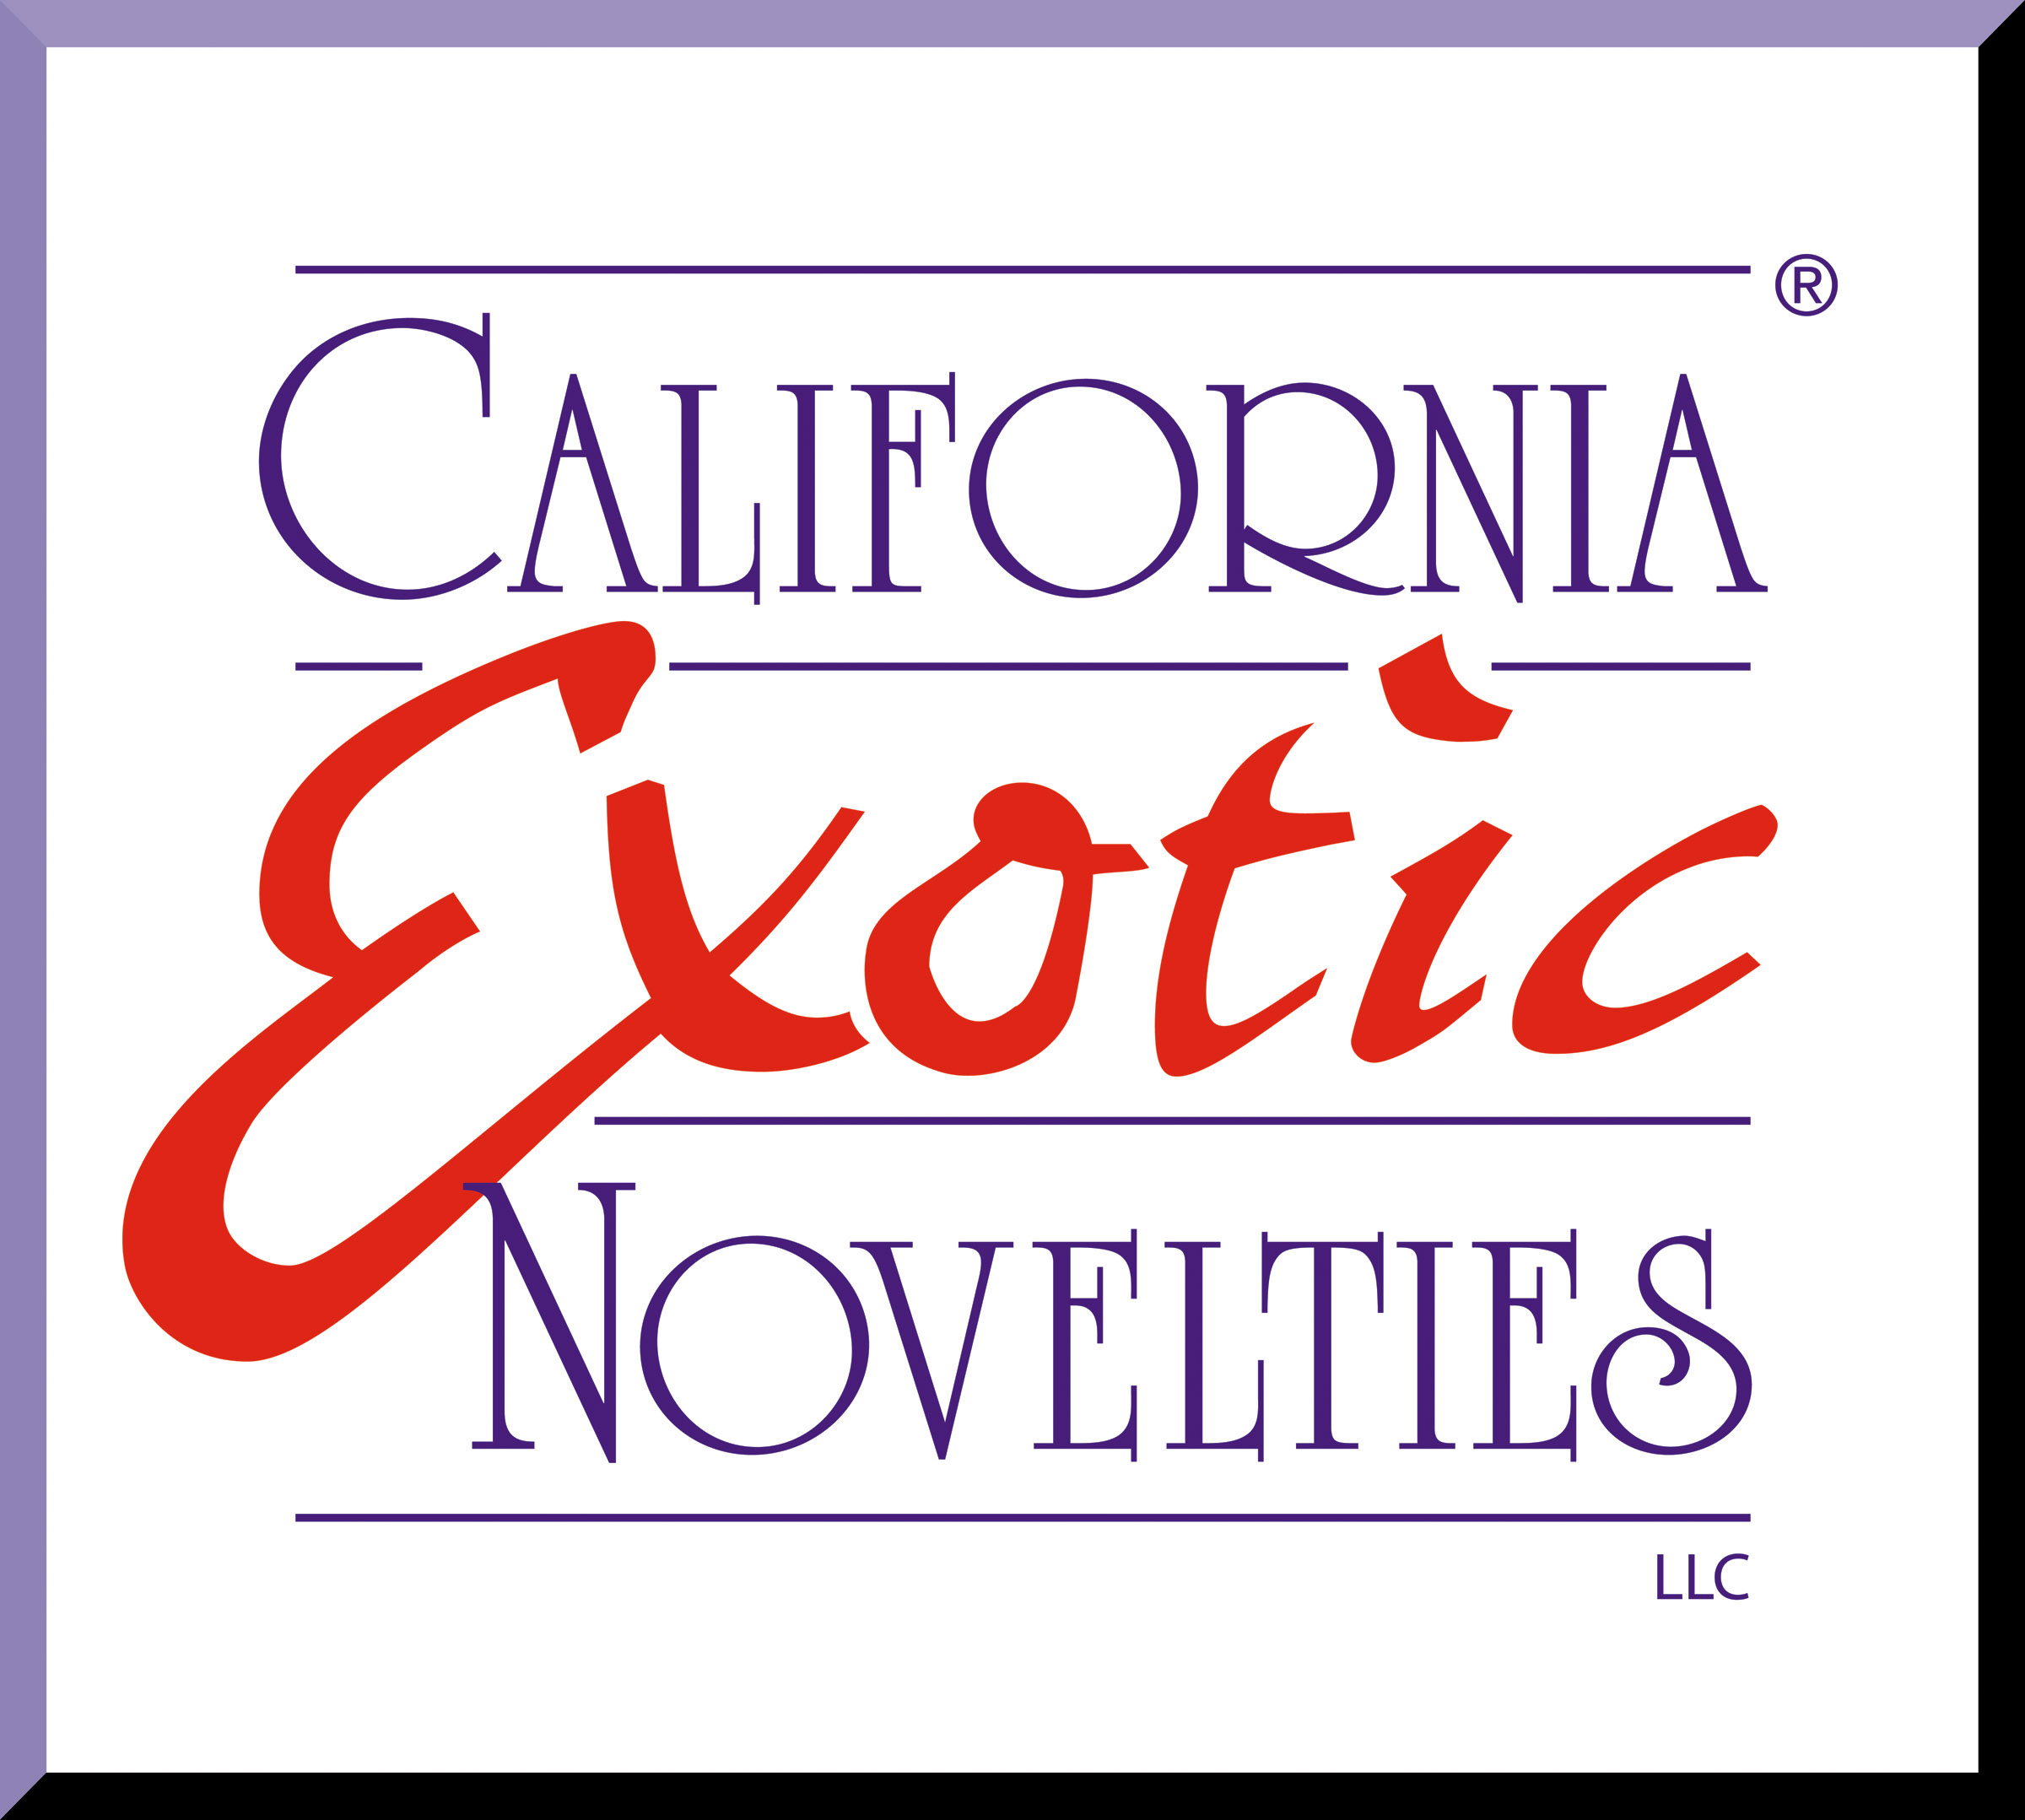 Exotic California Novelties